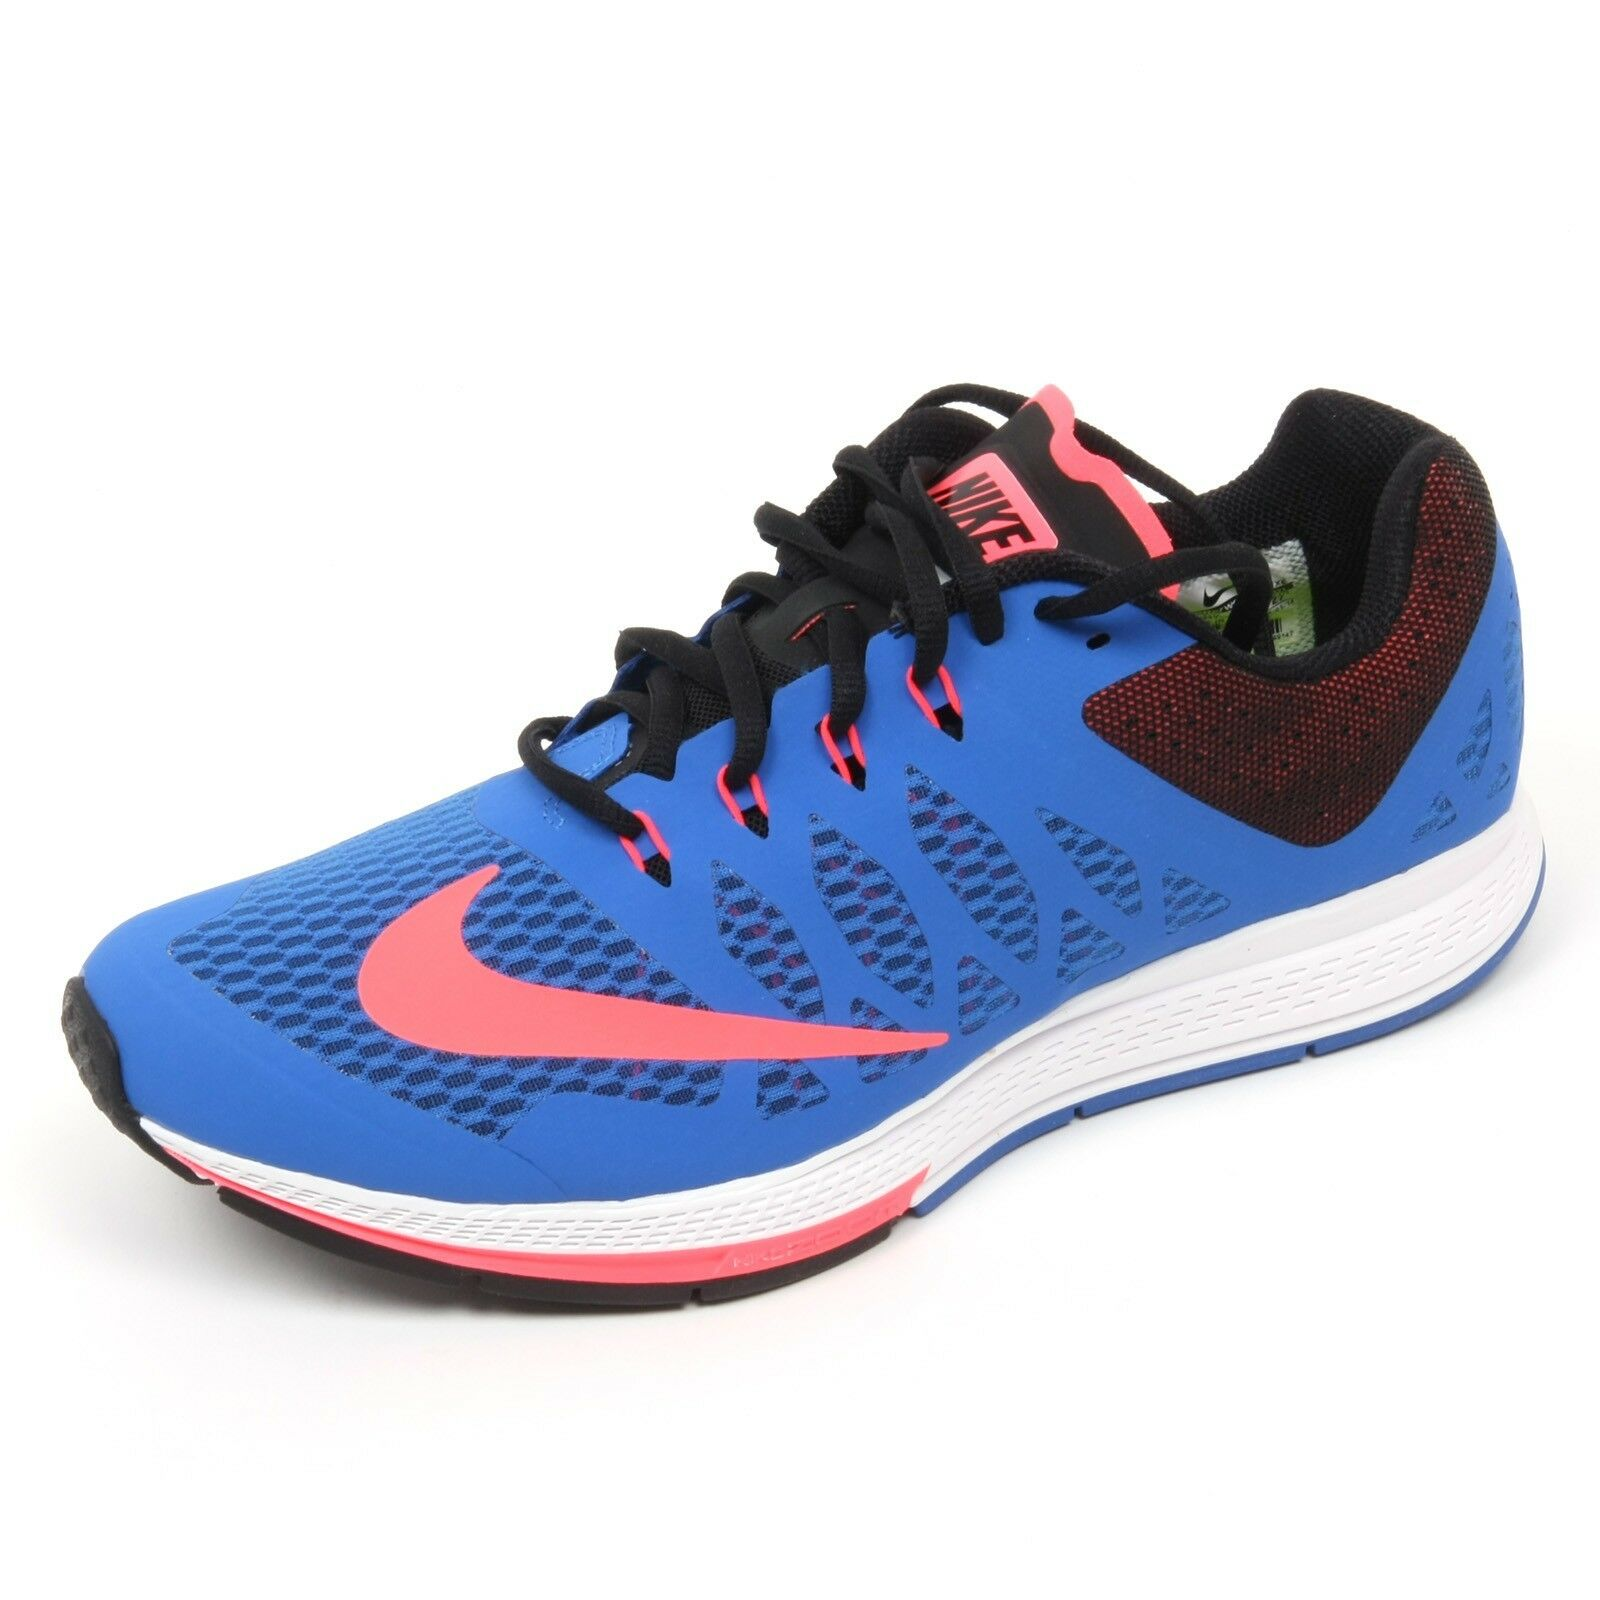 C5274 sneaker hombre 7 NIKE AIR ZOOM ELITE 7 hombre blu cobalto Zapatos Hombre cae9c5